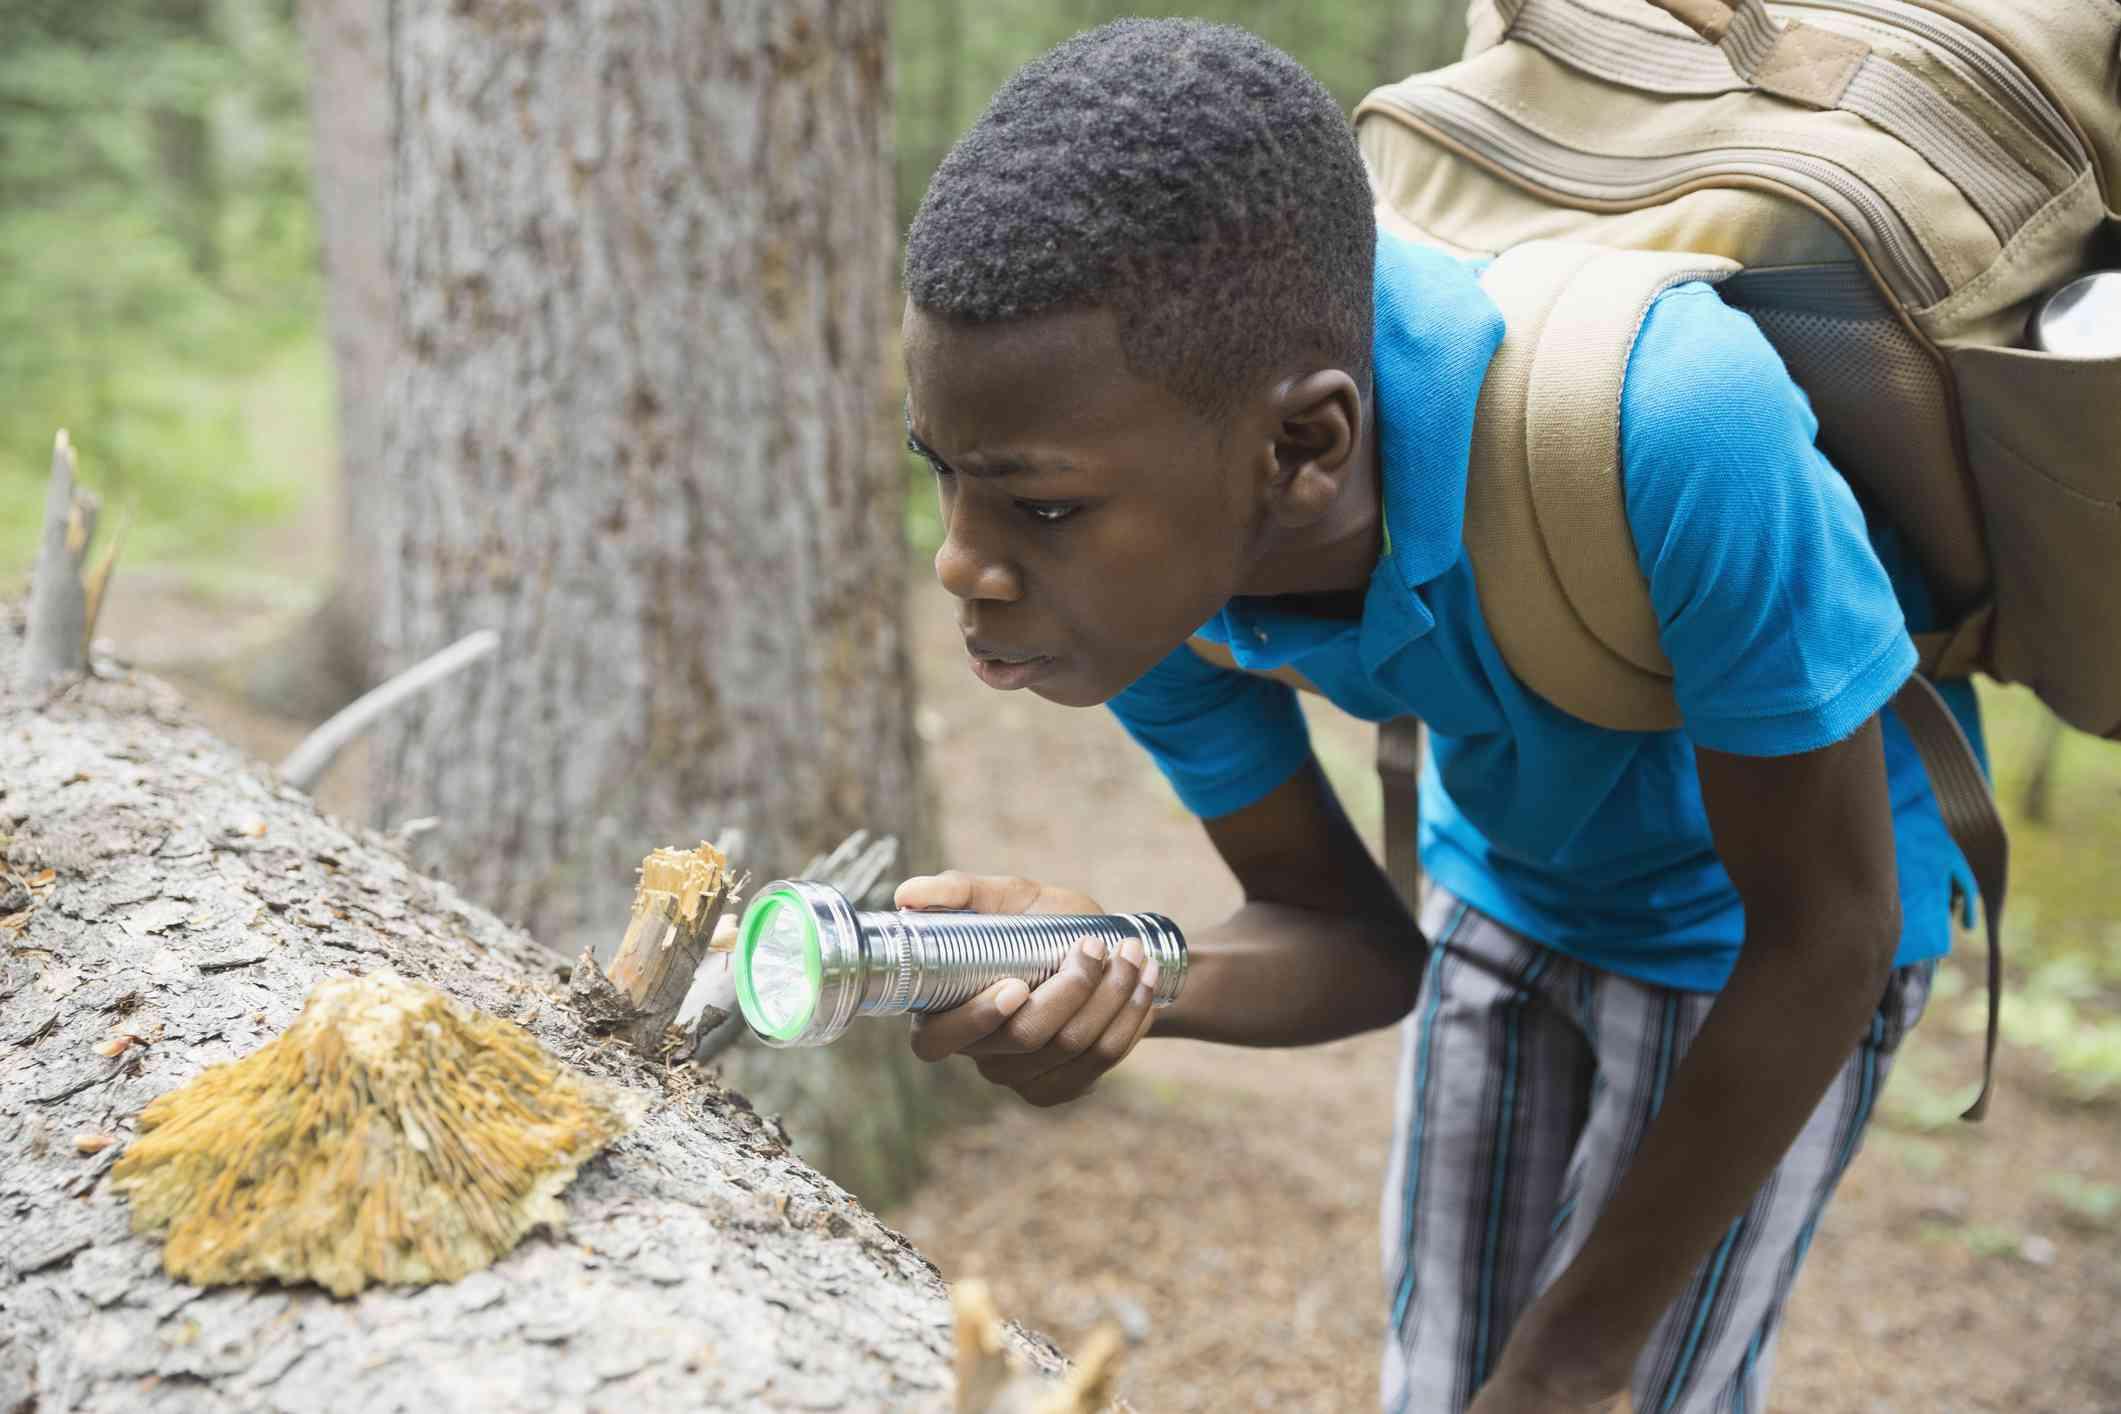 A young boy examining fungus with a flashlight.